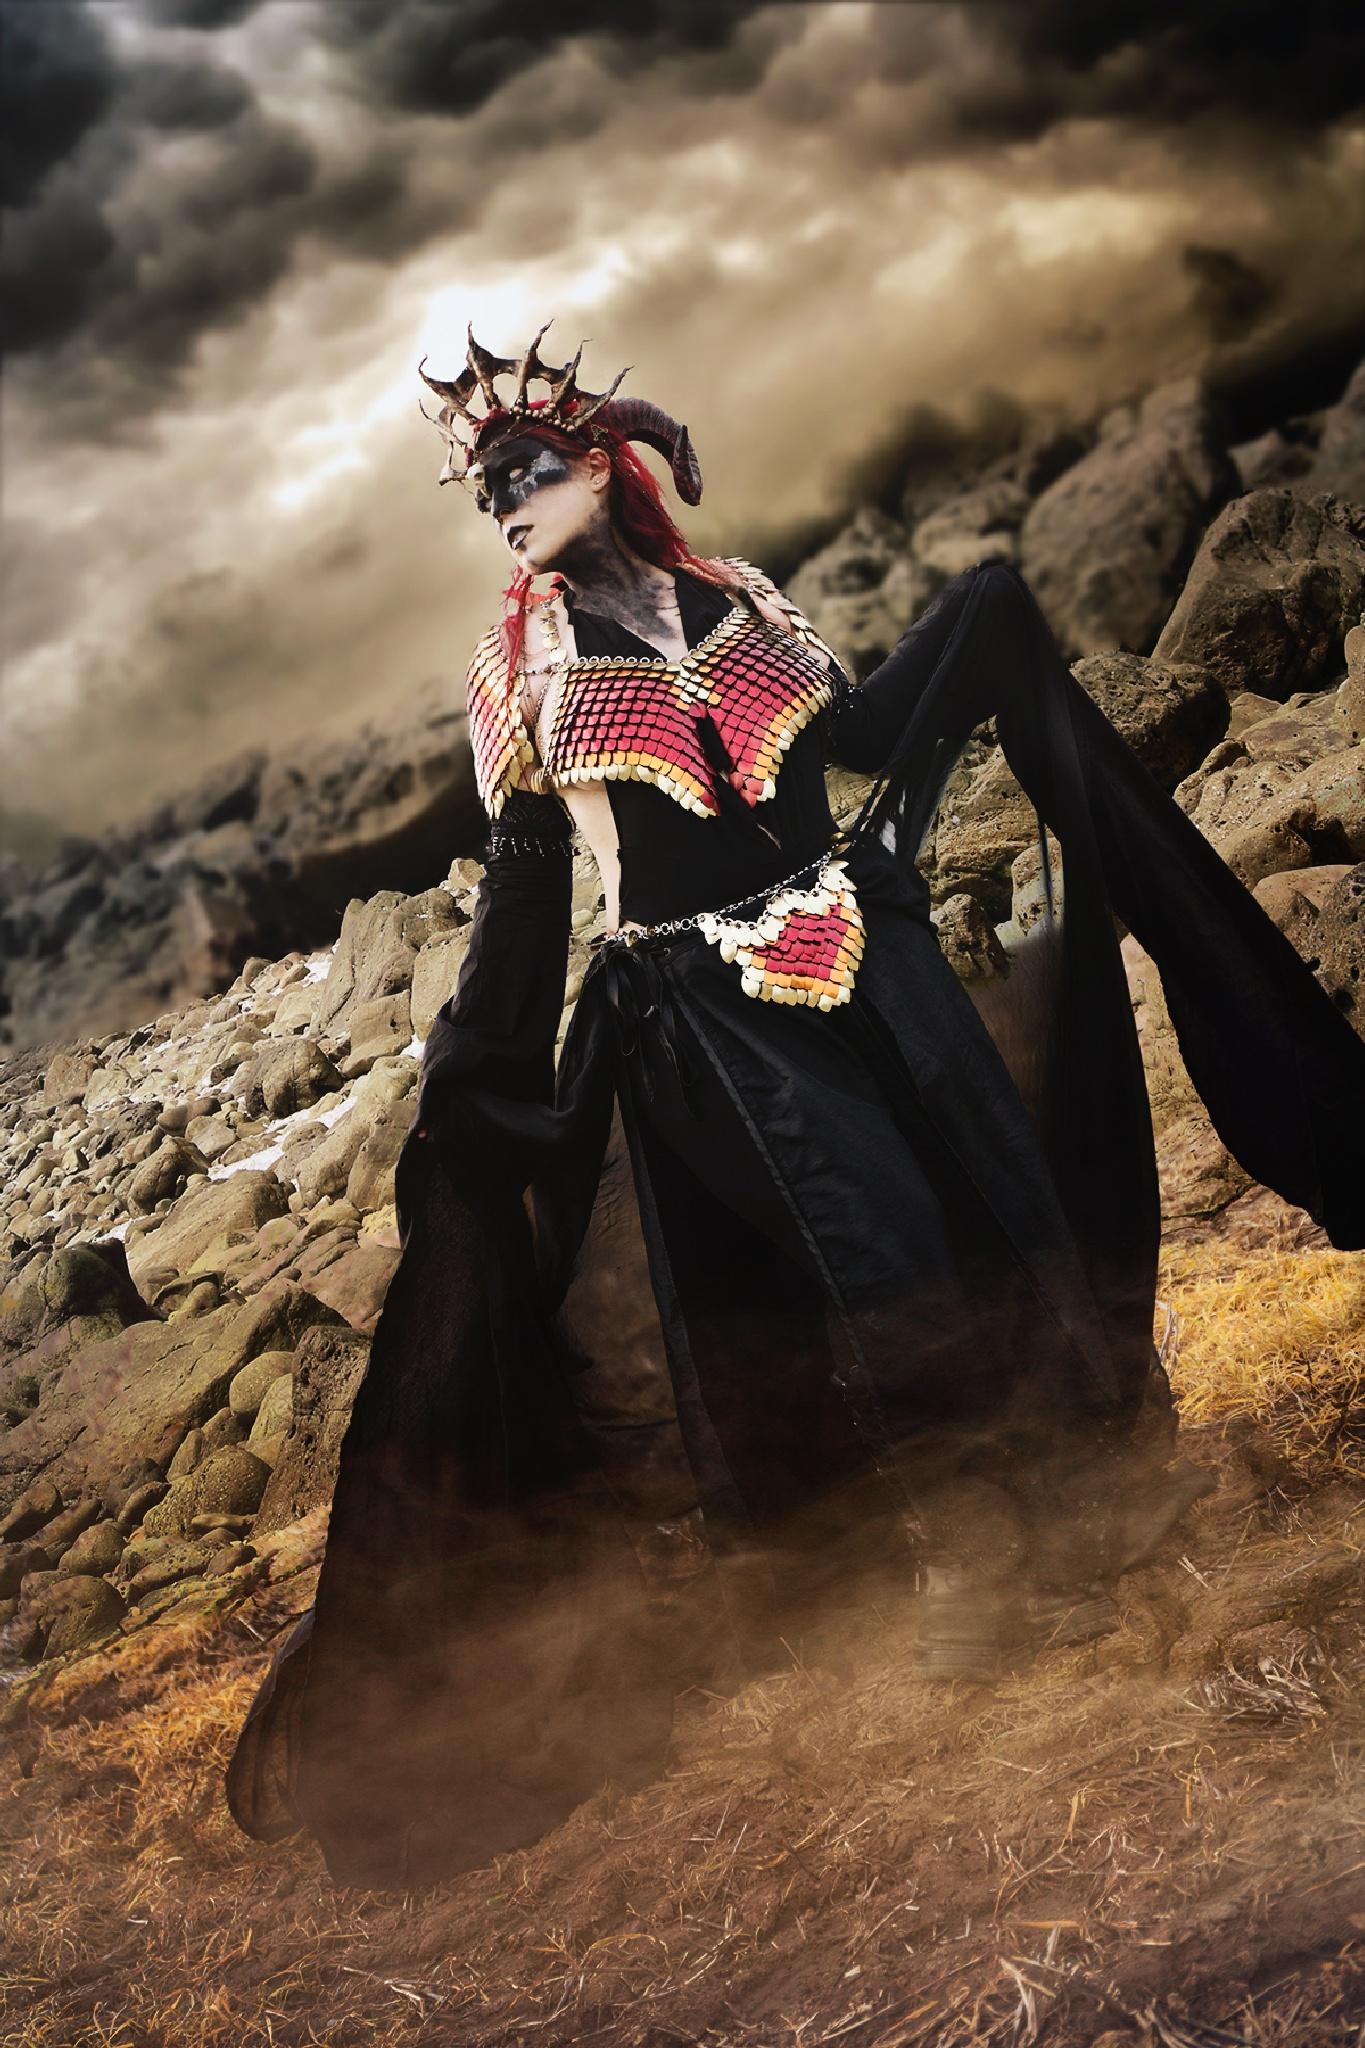 Demons wrath II by Unholy Beauty Fotodesign